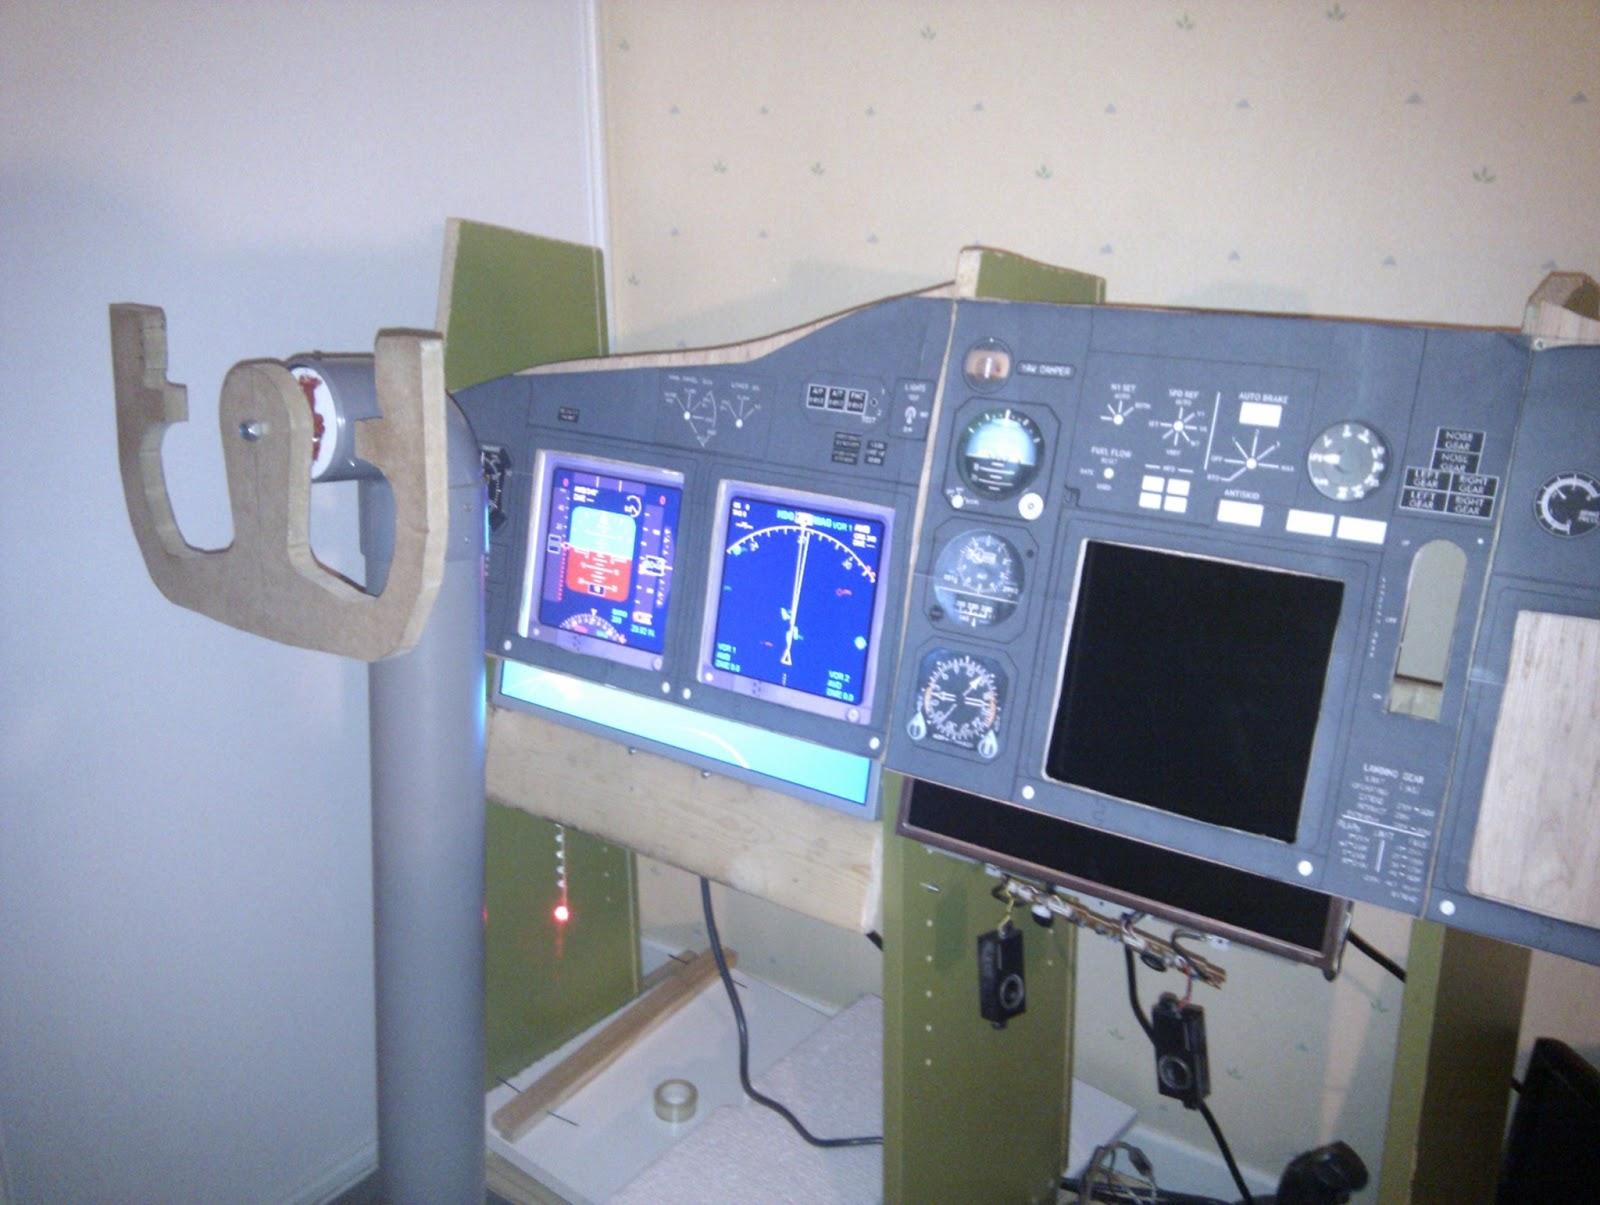 My Sim Cockpit Project: Construction